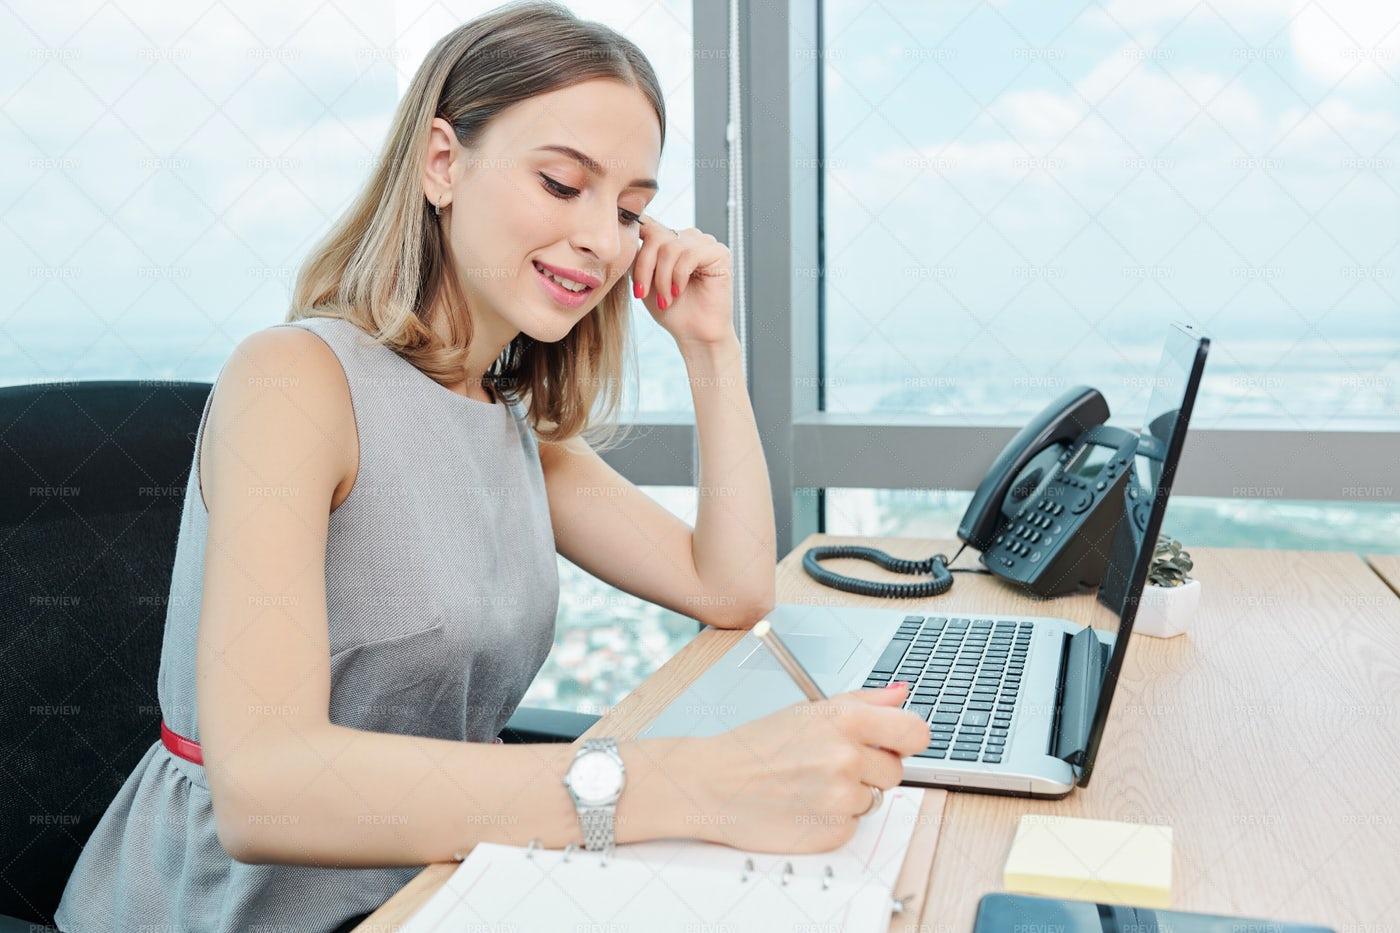 Pretty Woman Writing Down Creative: Stock Photos